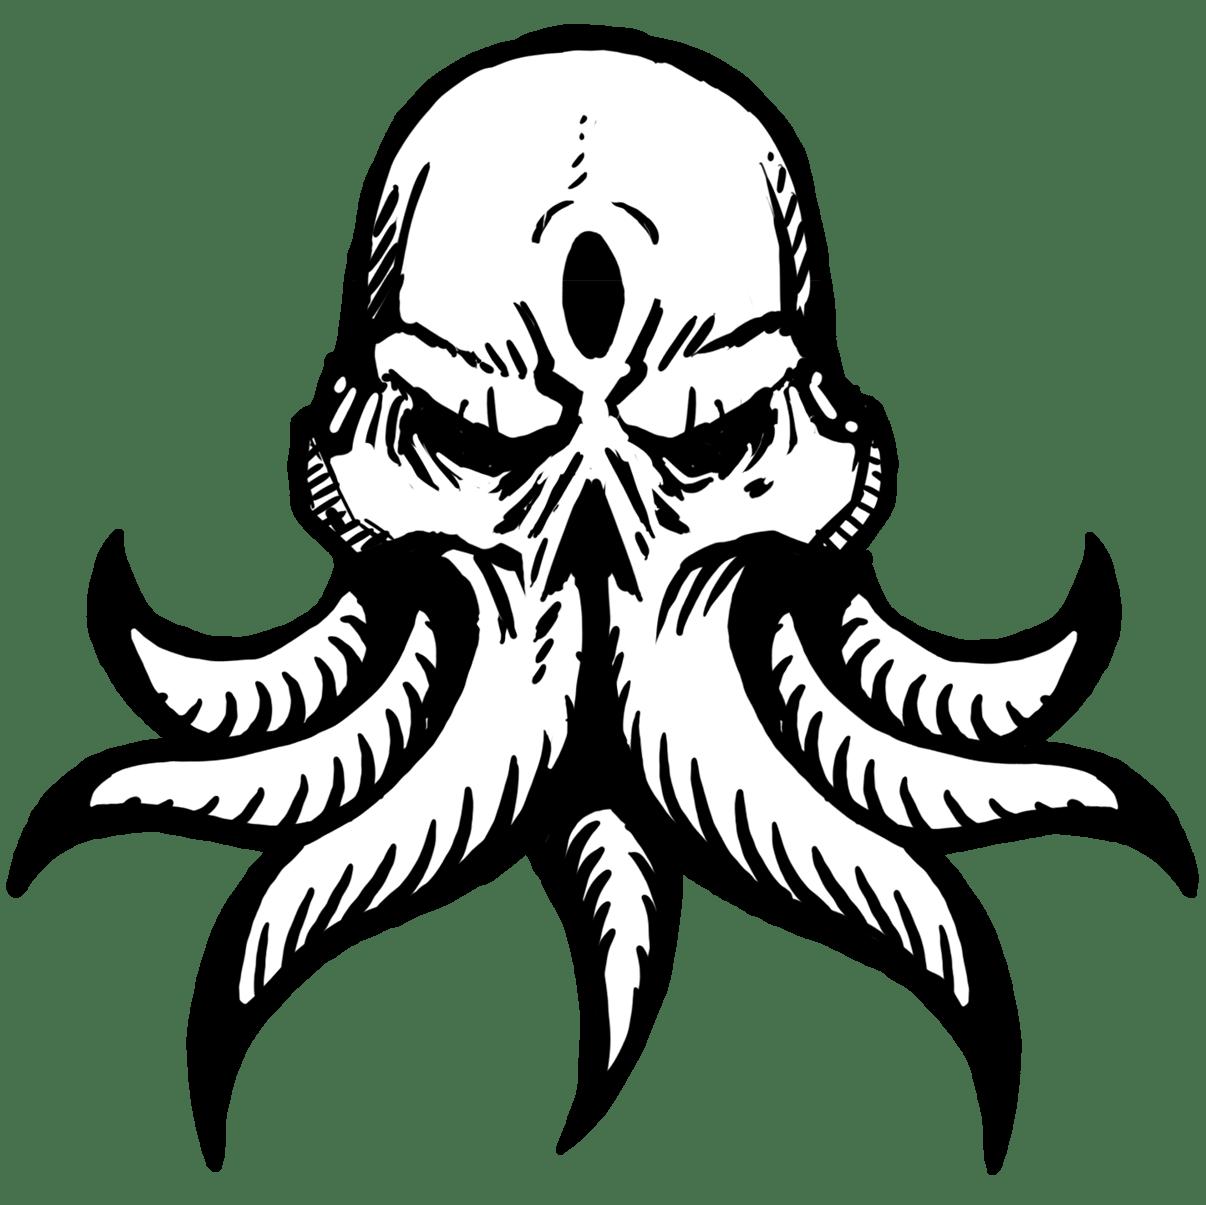 cthulhu logo Sök på Google Krank of Cthulhu